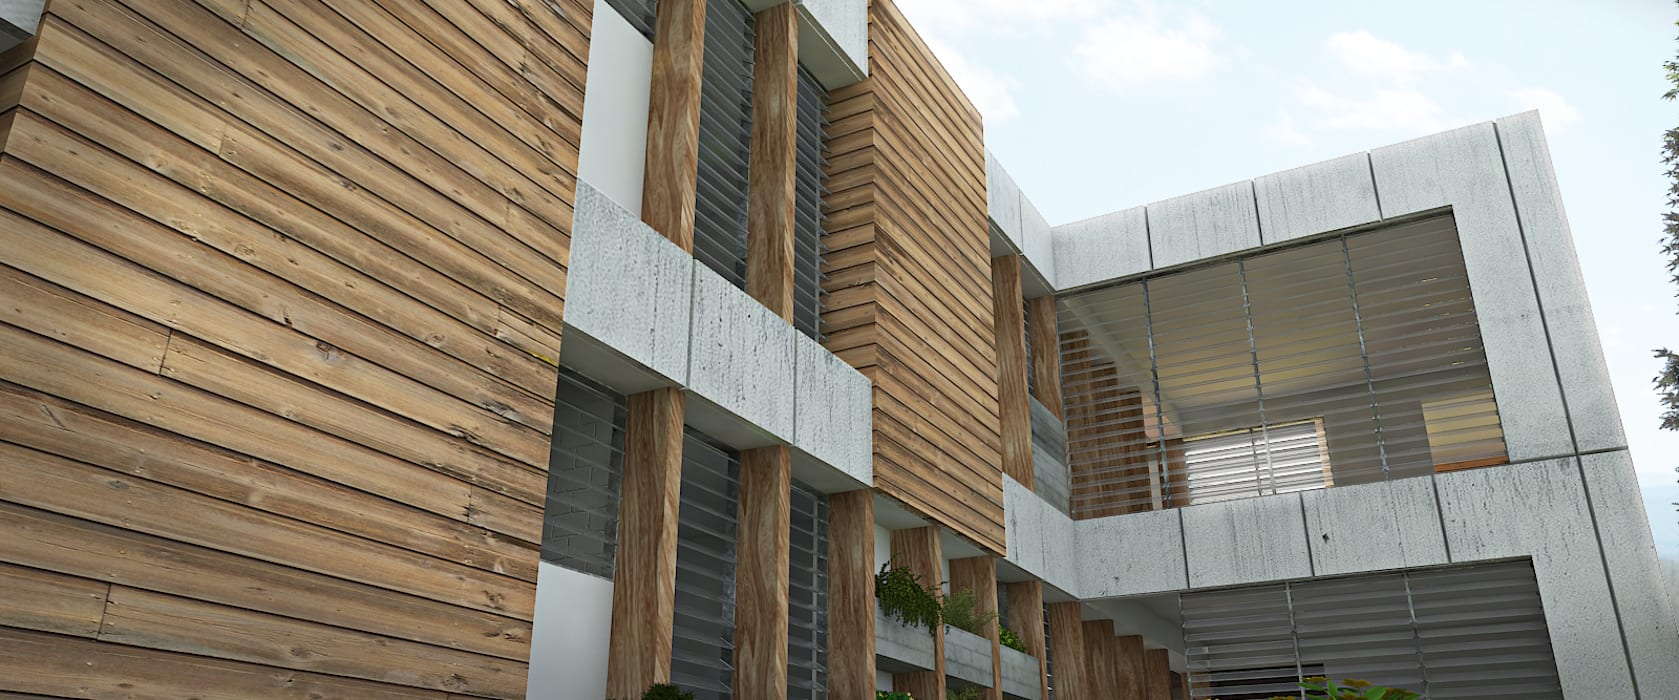 AREA DE AMPLIACION Casas de estilo minimalista de Arq.AngelMedina+ Minimalista Ladrillos